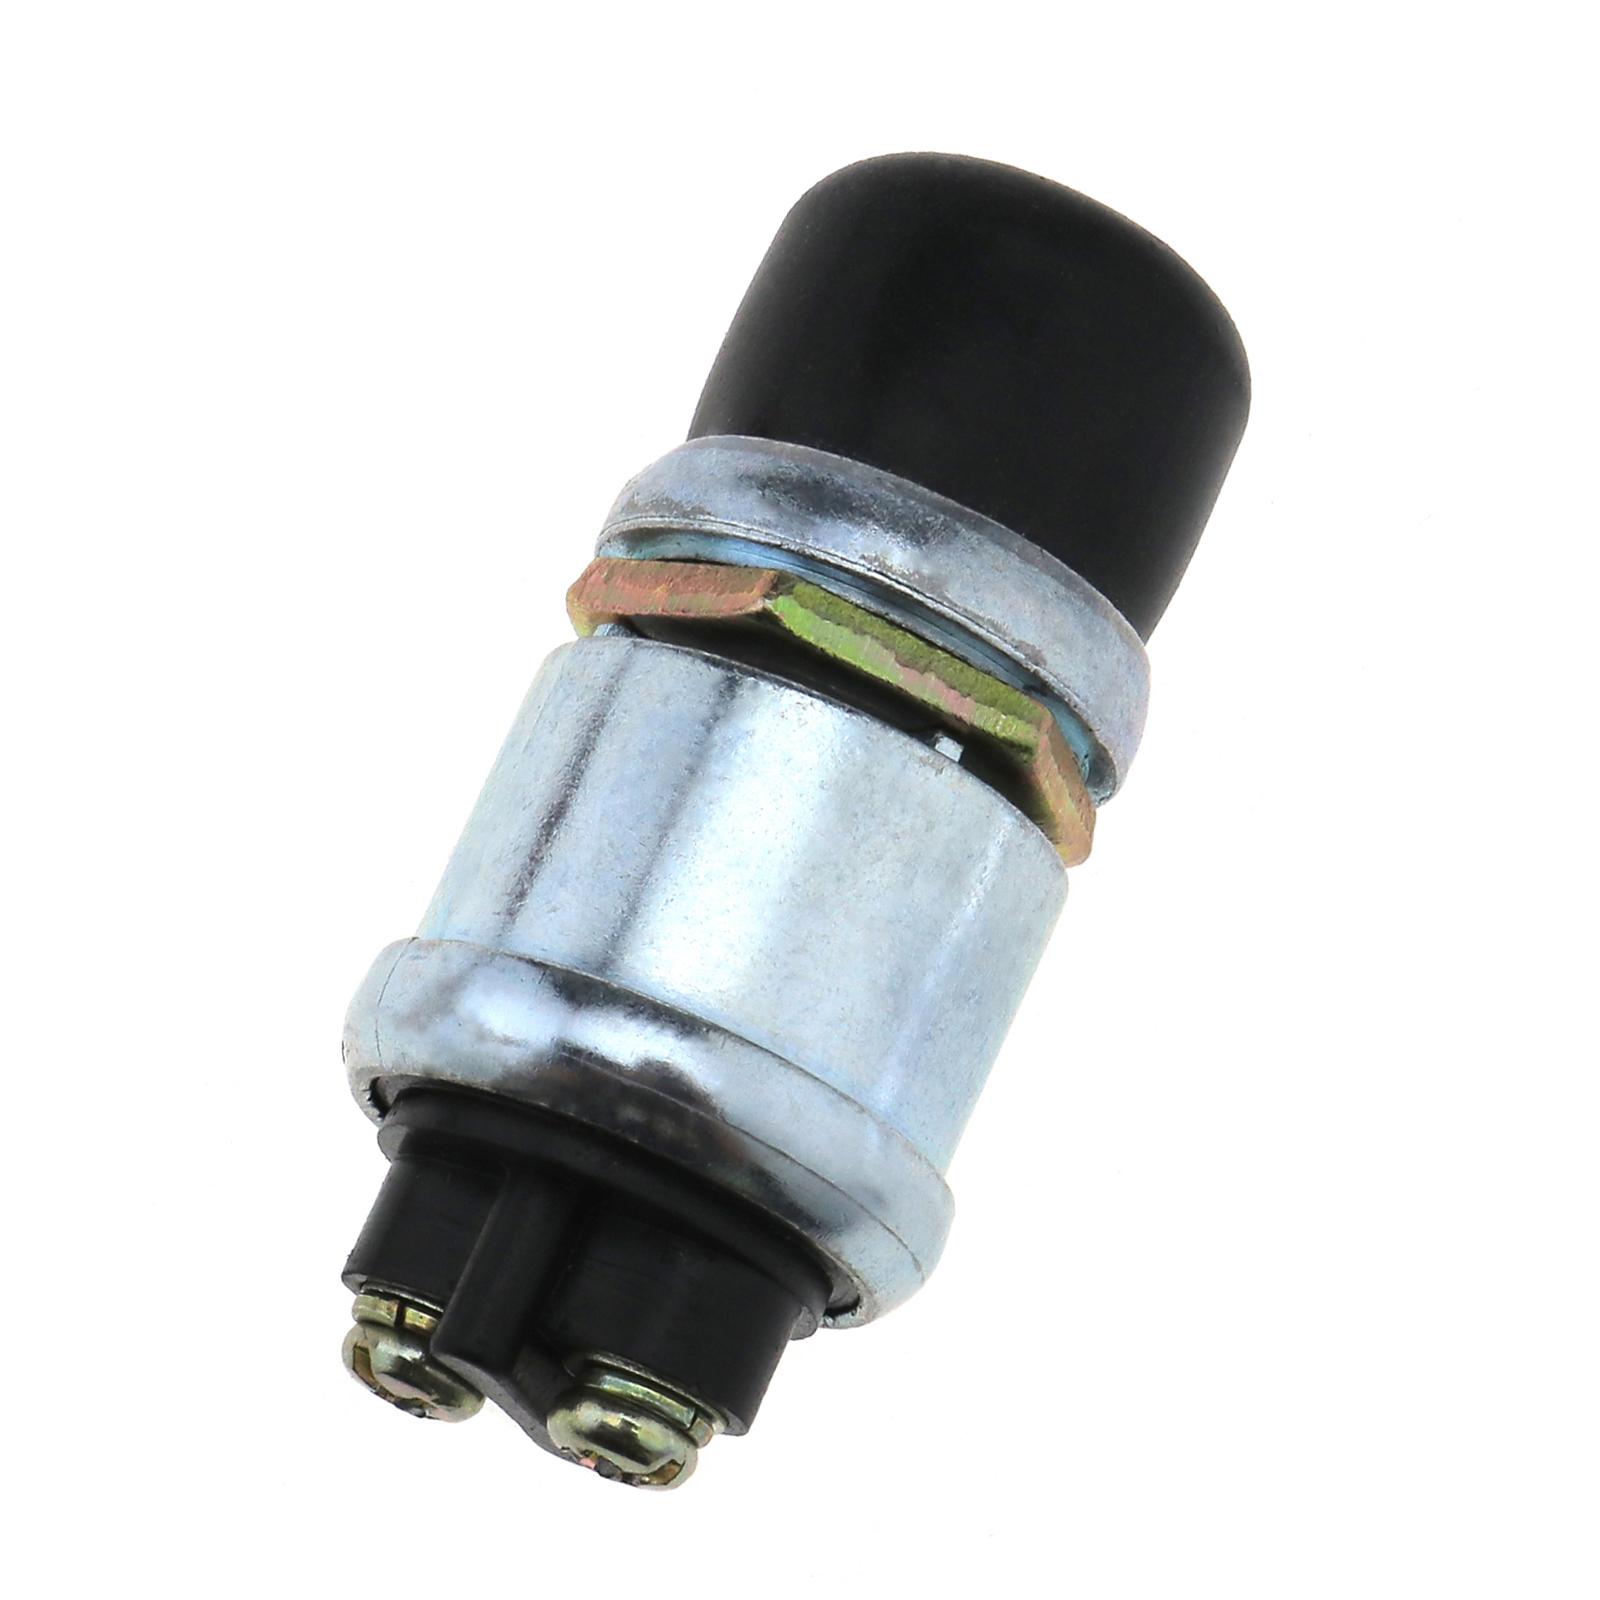 Standard Ignition Starter Solenoid SS-571